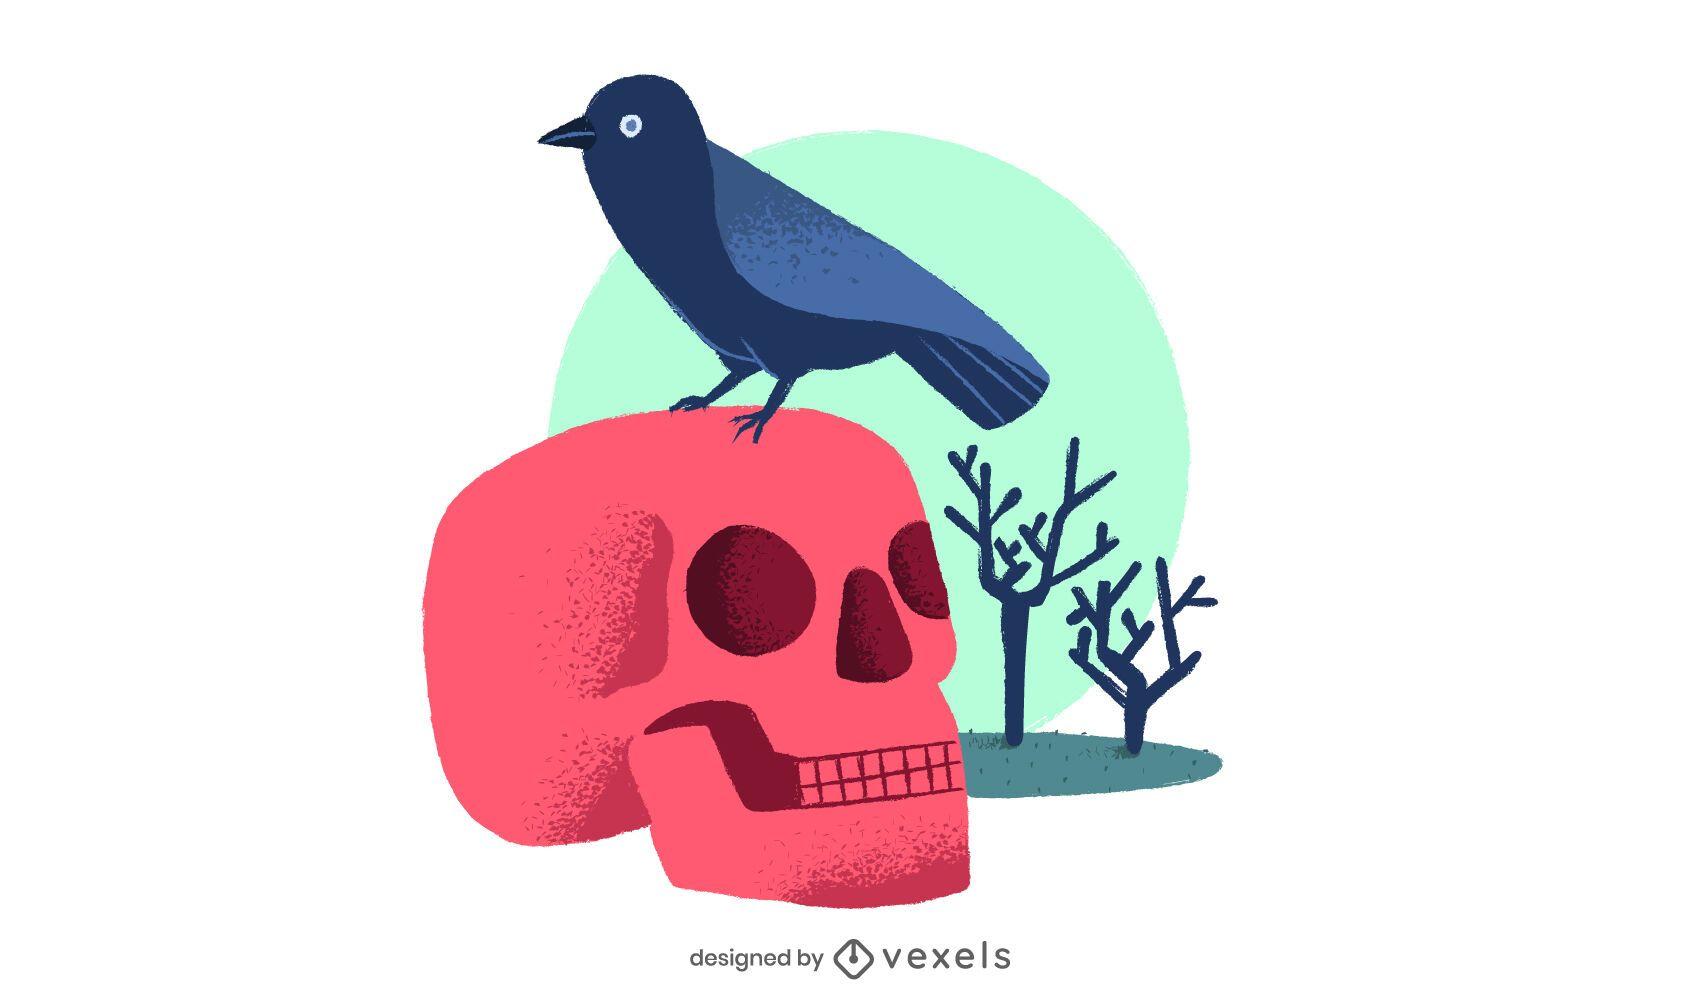 Skull and crow illustration design